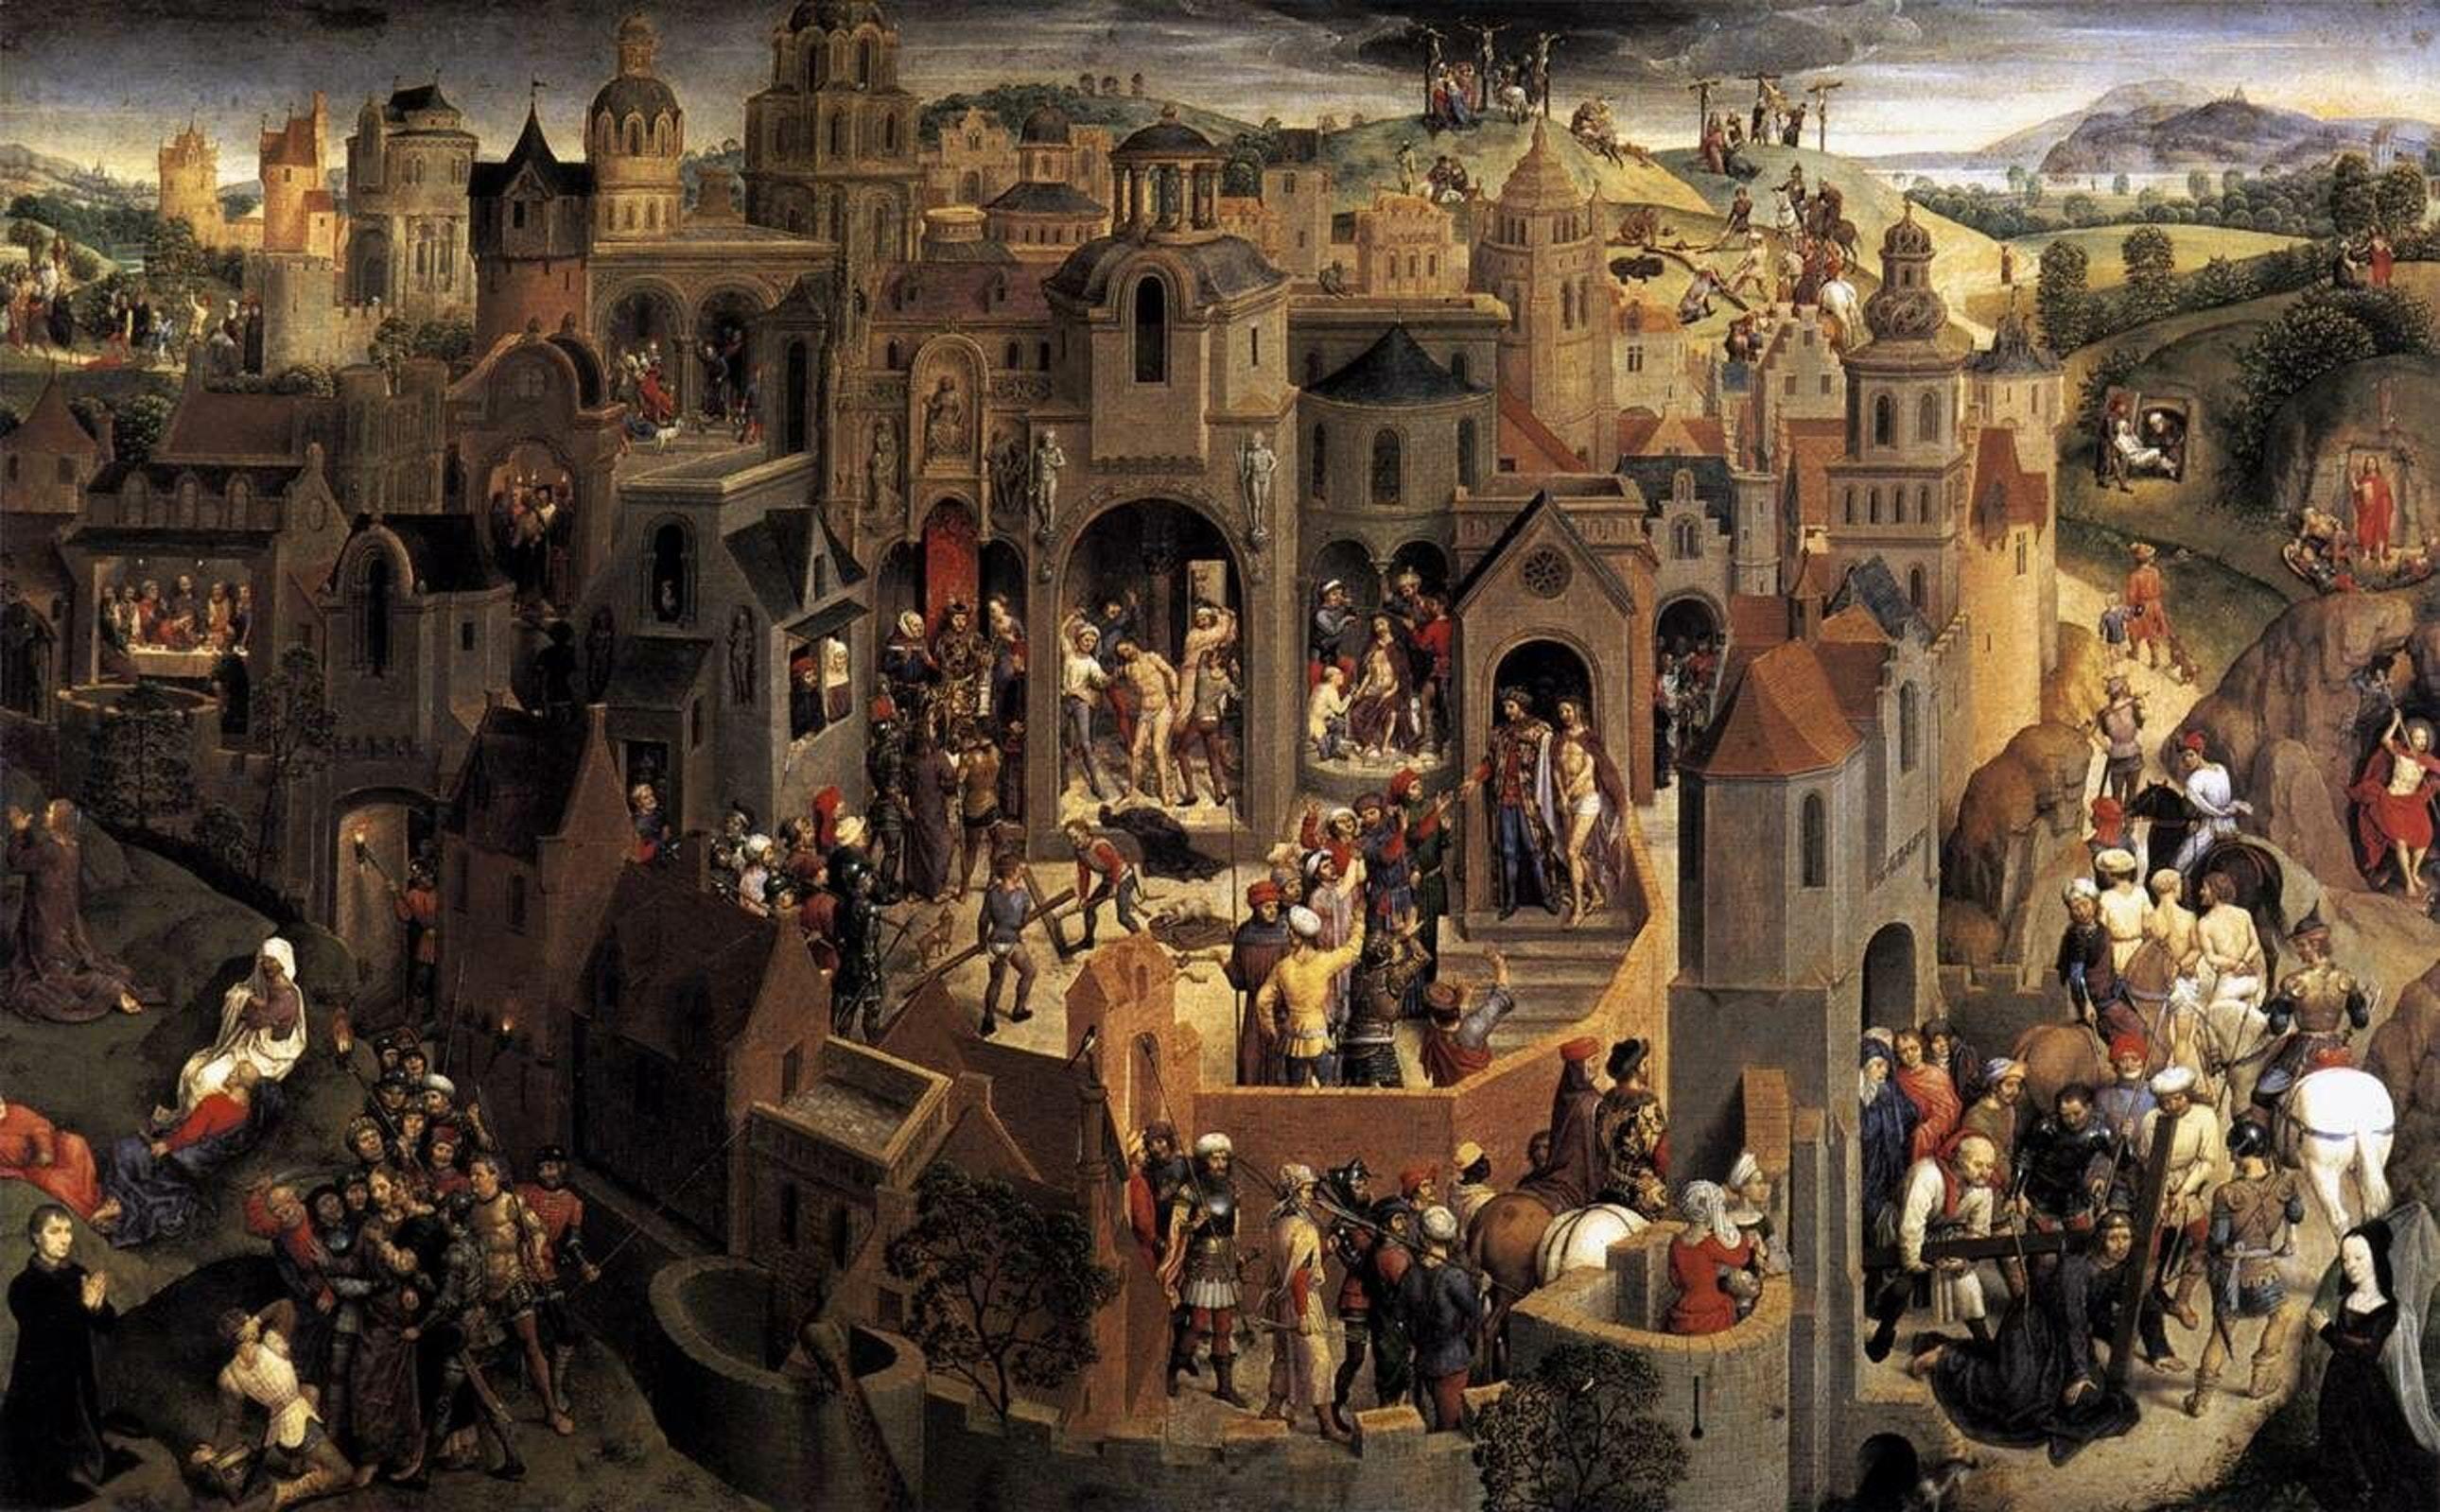 «Страсти Господни», Ганс Мемлинг, 1470-1471